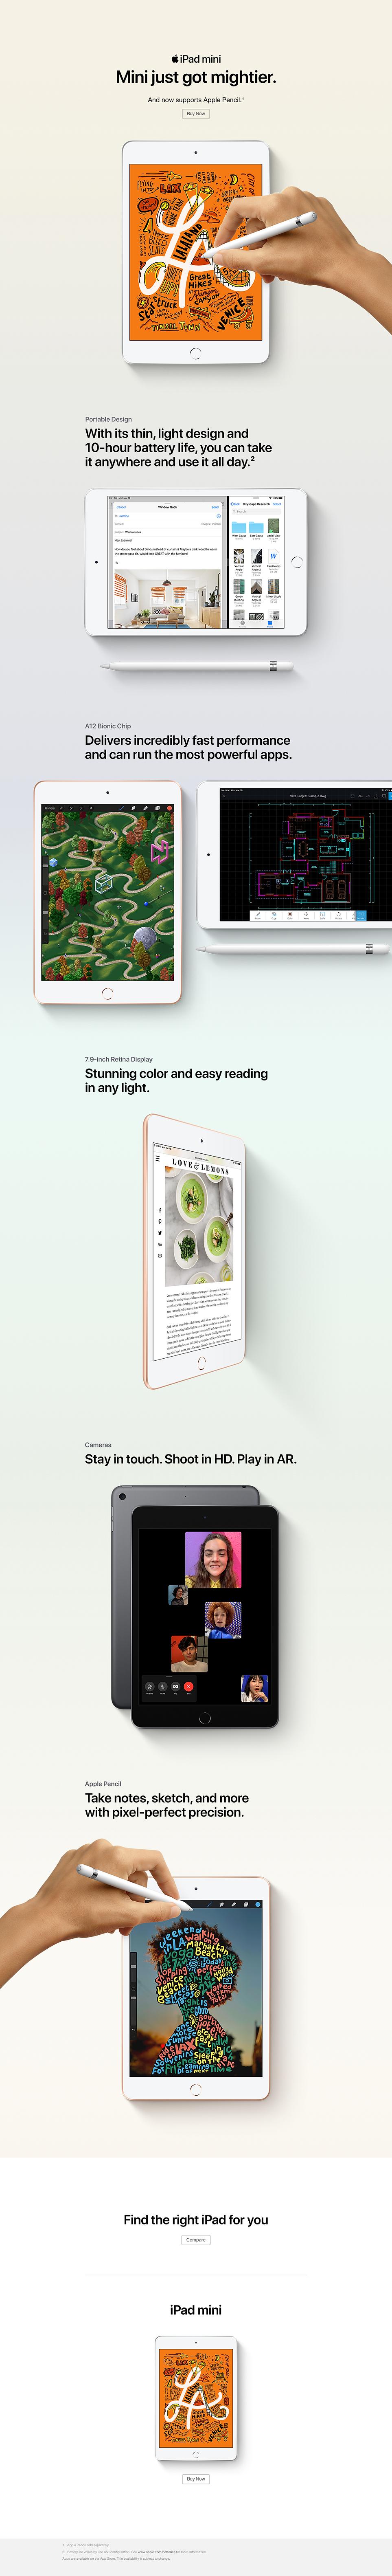 iPadmini-web.png